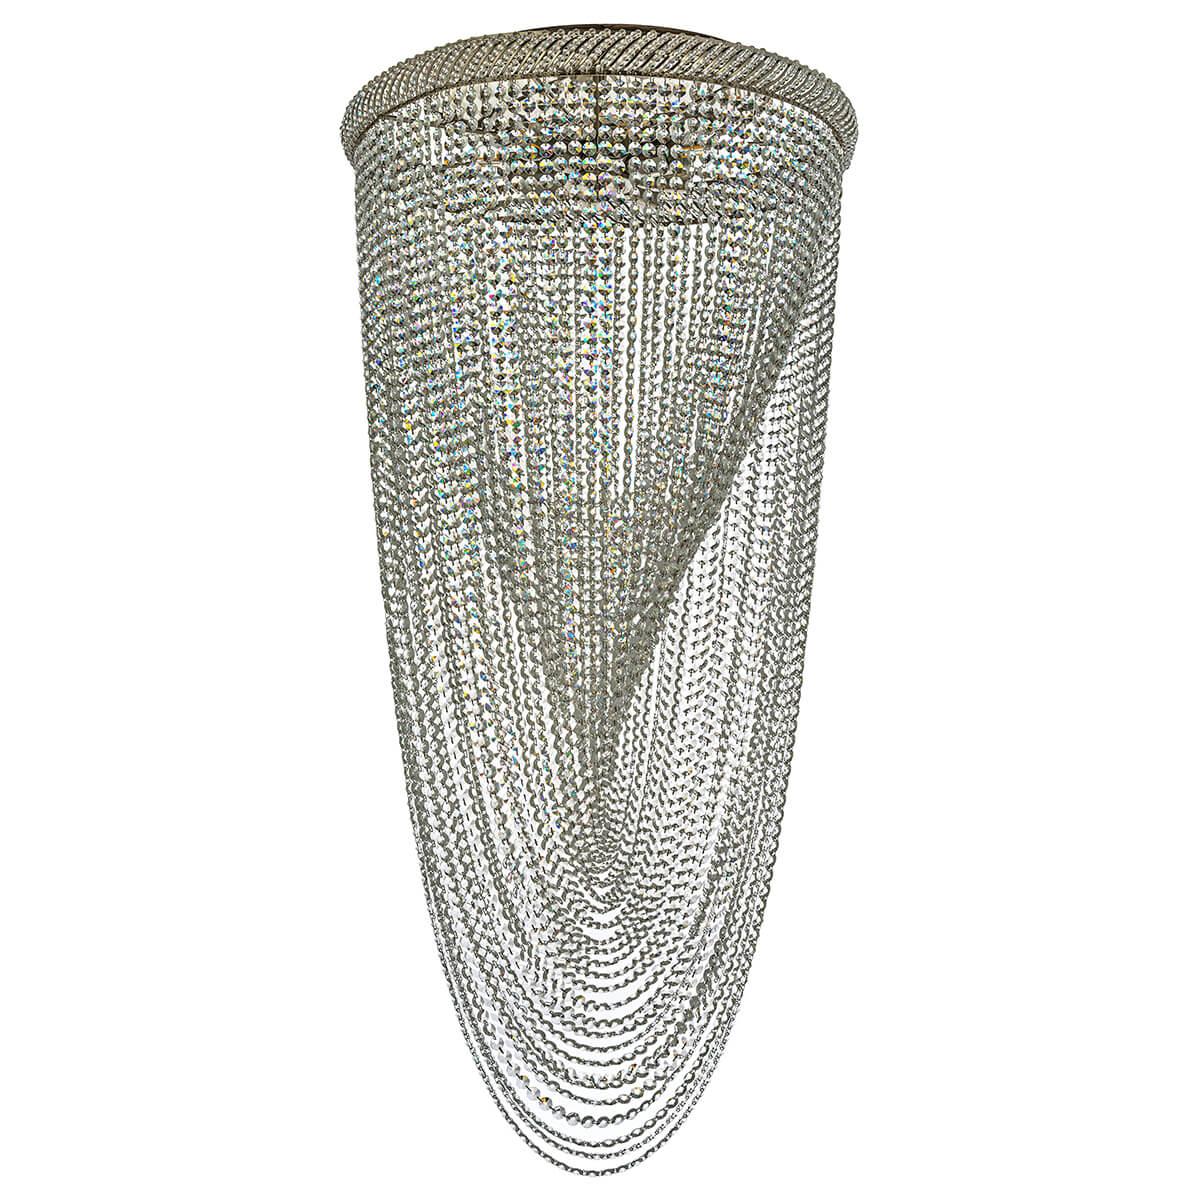 цена на Люстра Dio D`arte Bari E 1.2.60.104 N Bari Nickel